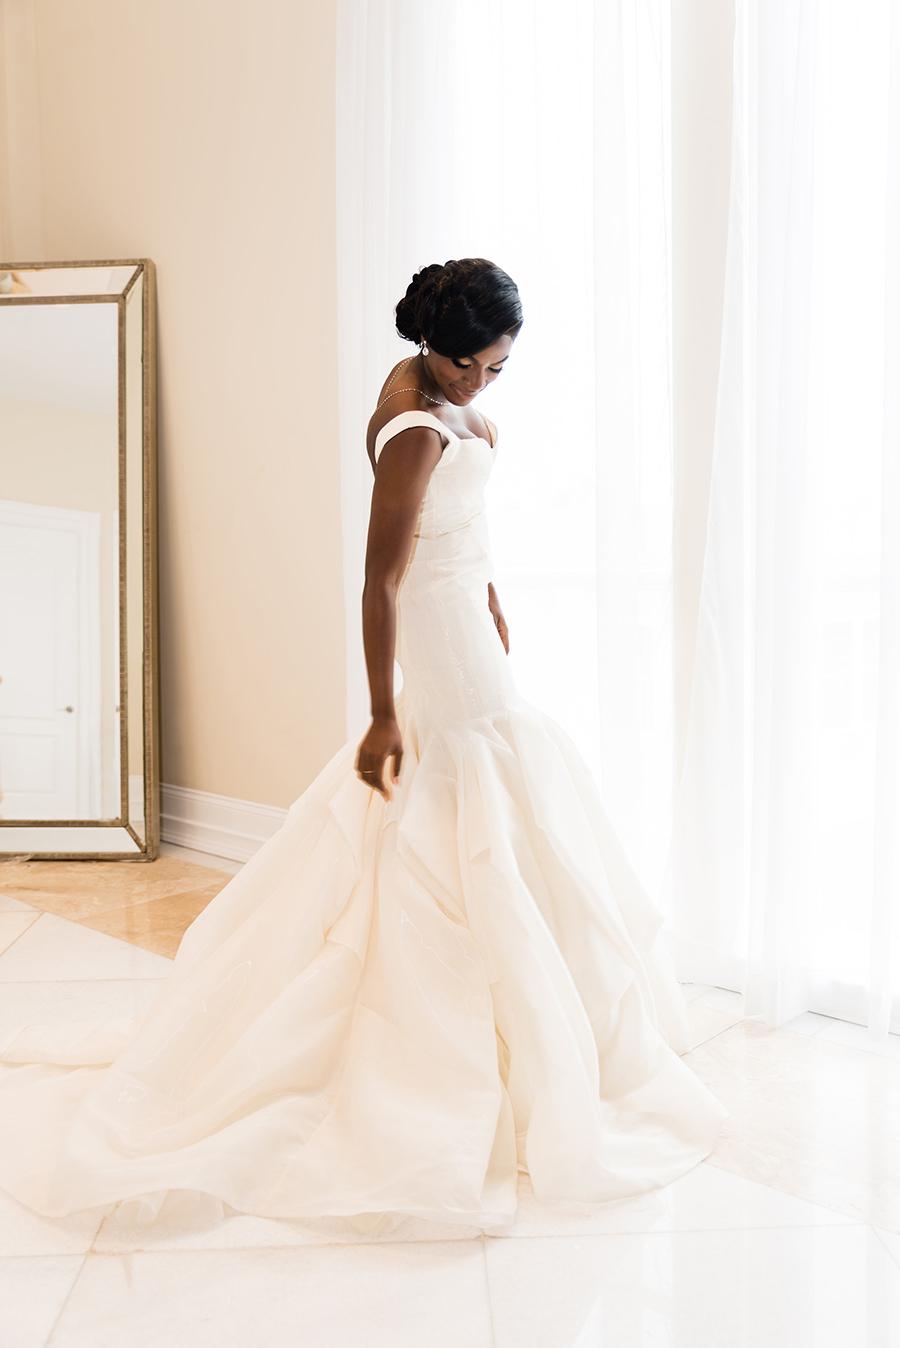 Sade_Ayo_Nigerian_Bellevue_Conference_wedding_Petronella_Photography_155.jpg